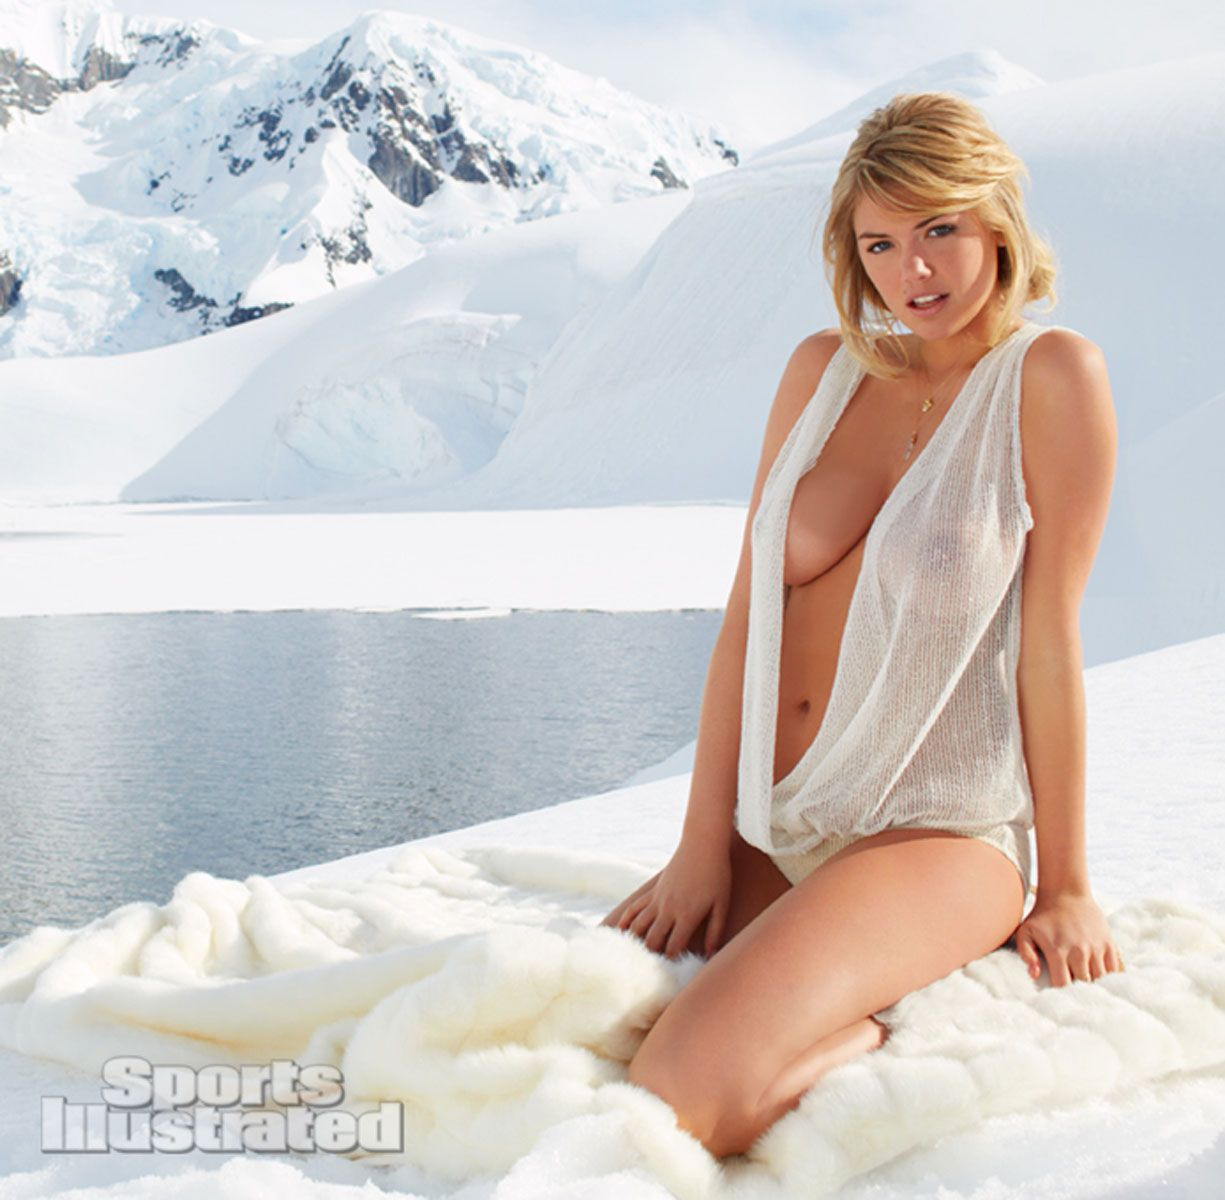 Kate Upton Was Photographed By Derek Kettela In Antarctica